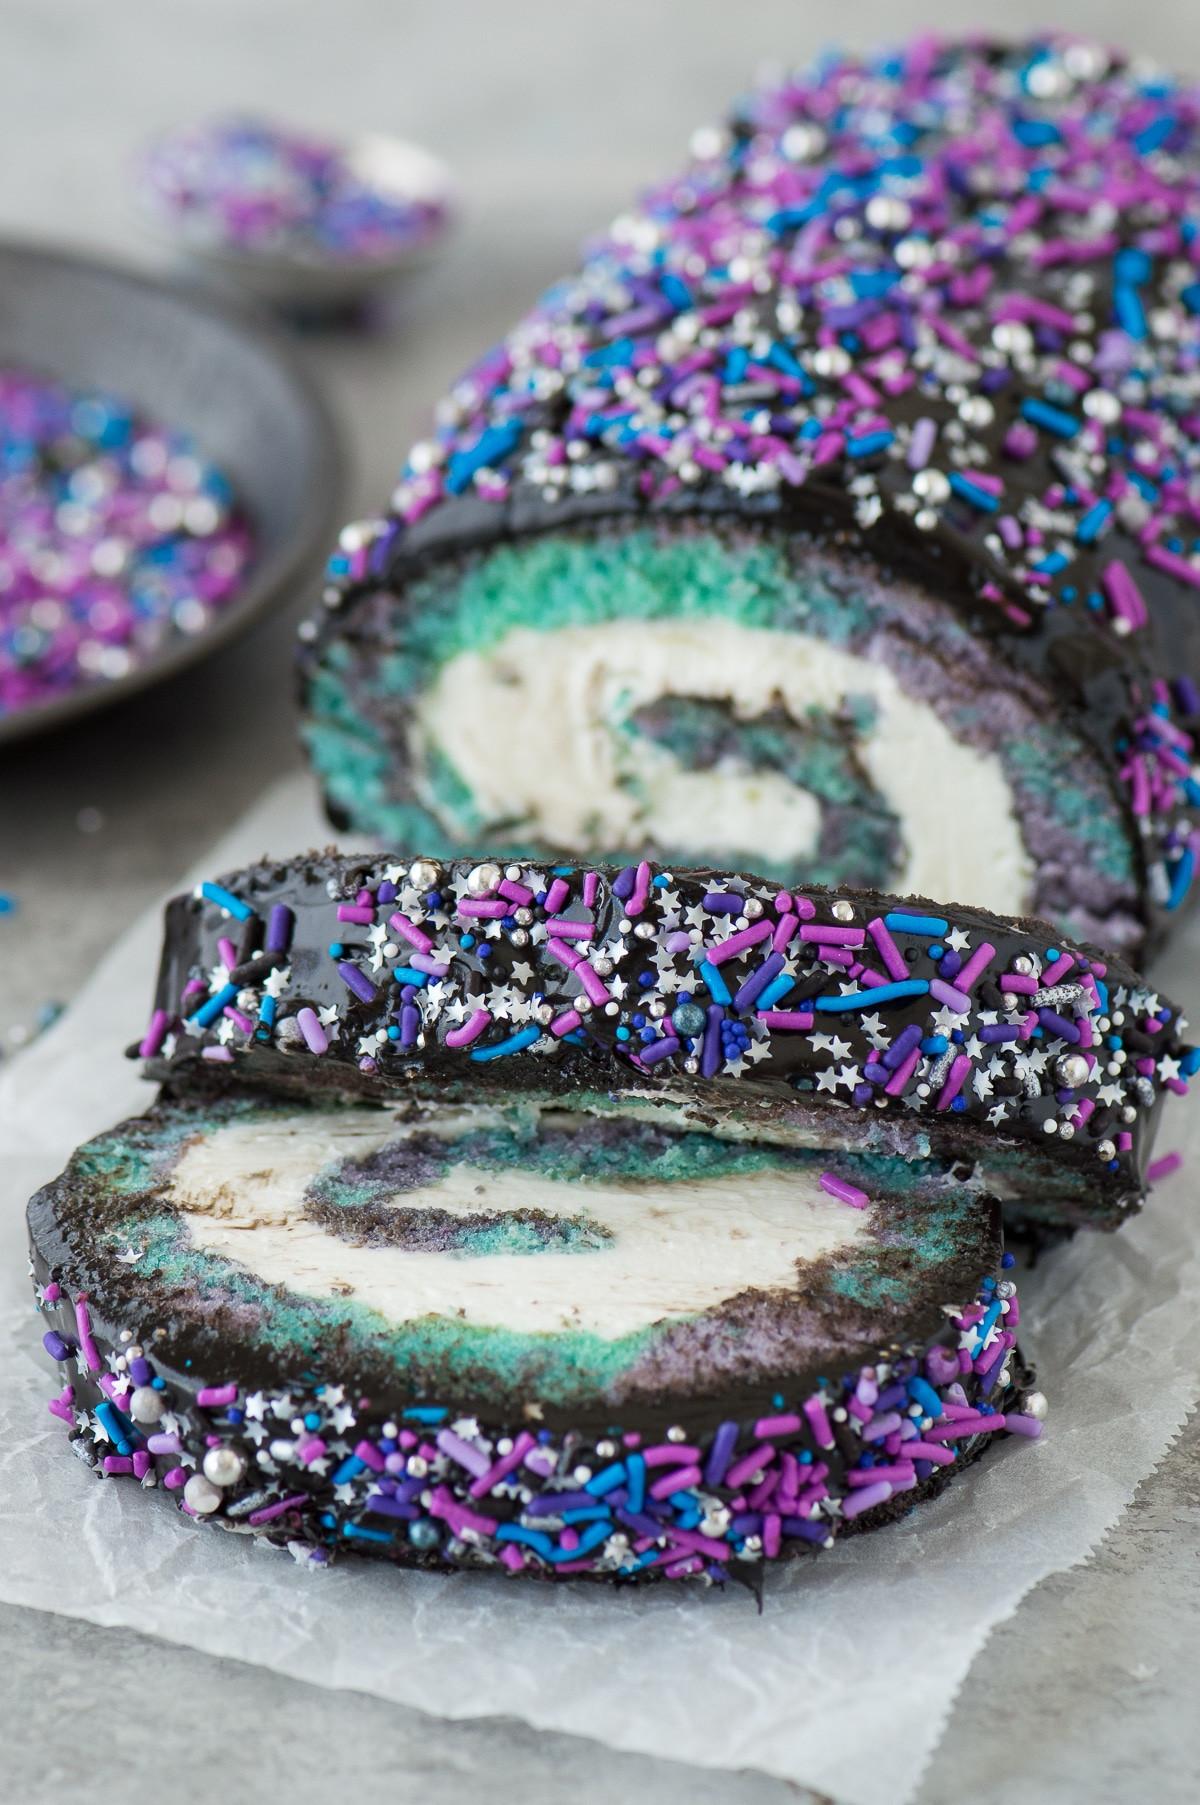 Galaxy Cake Recipe  Galaxy Cake Roll